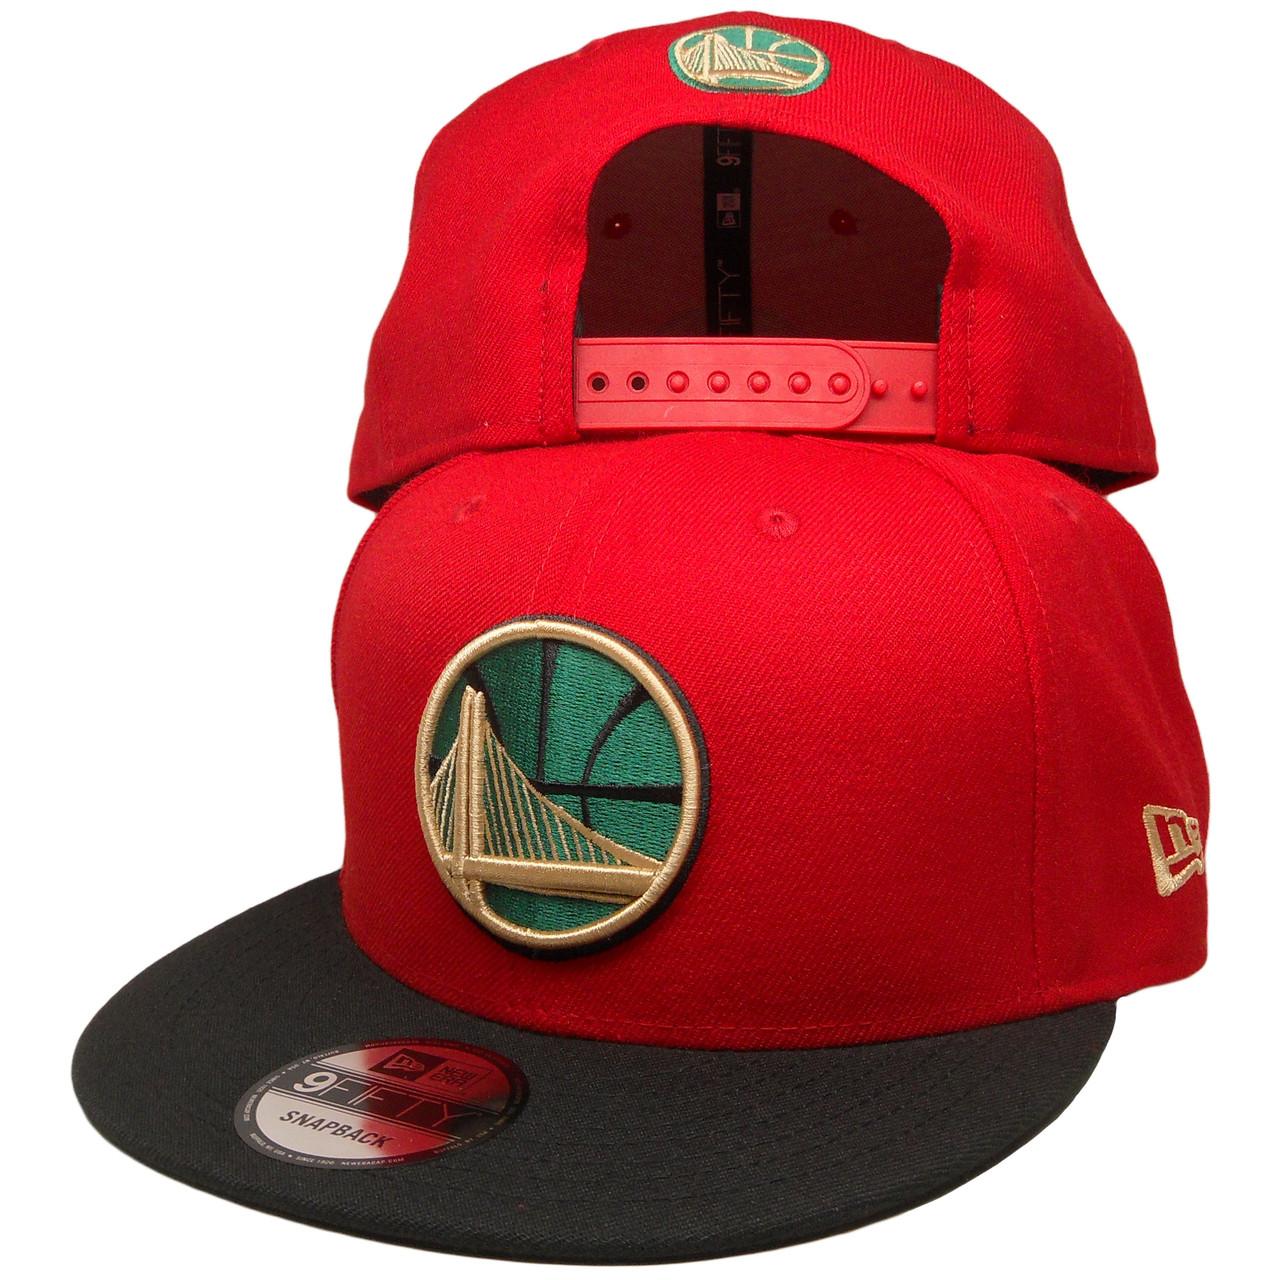 78fefb0e4c31 Golden State Warriors New Era Custom Gucci 9Fifty Snapback - Red ...